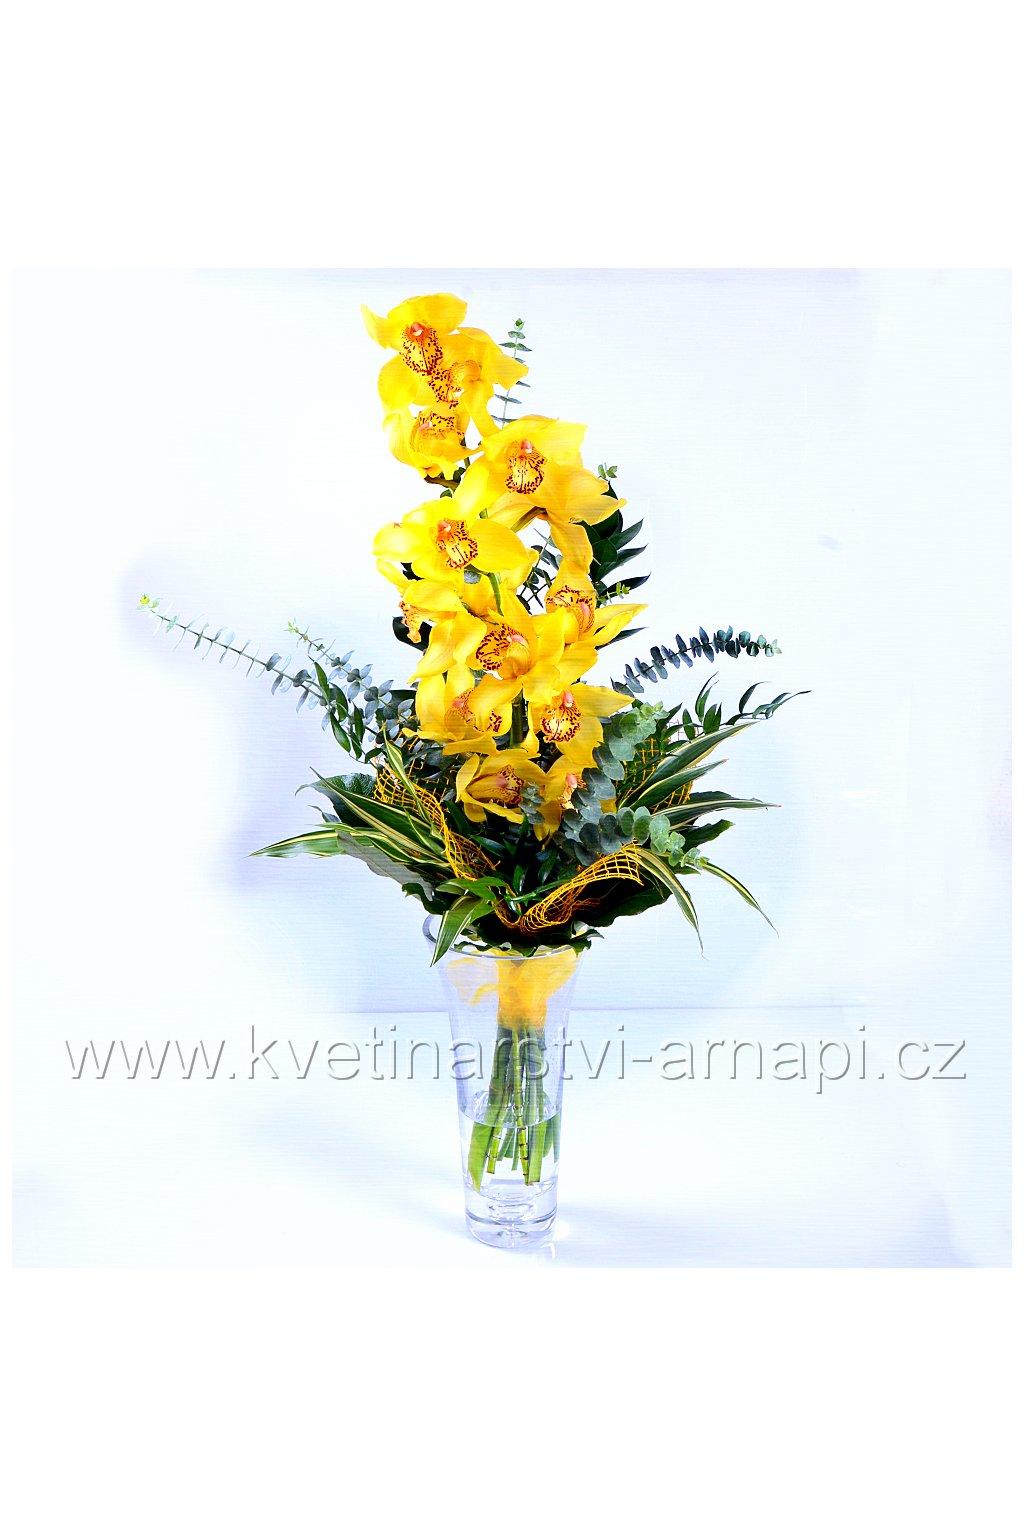 darkova kytice orchidej zluta kvetinarstvi arnapi